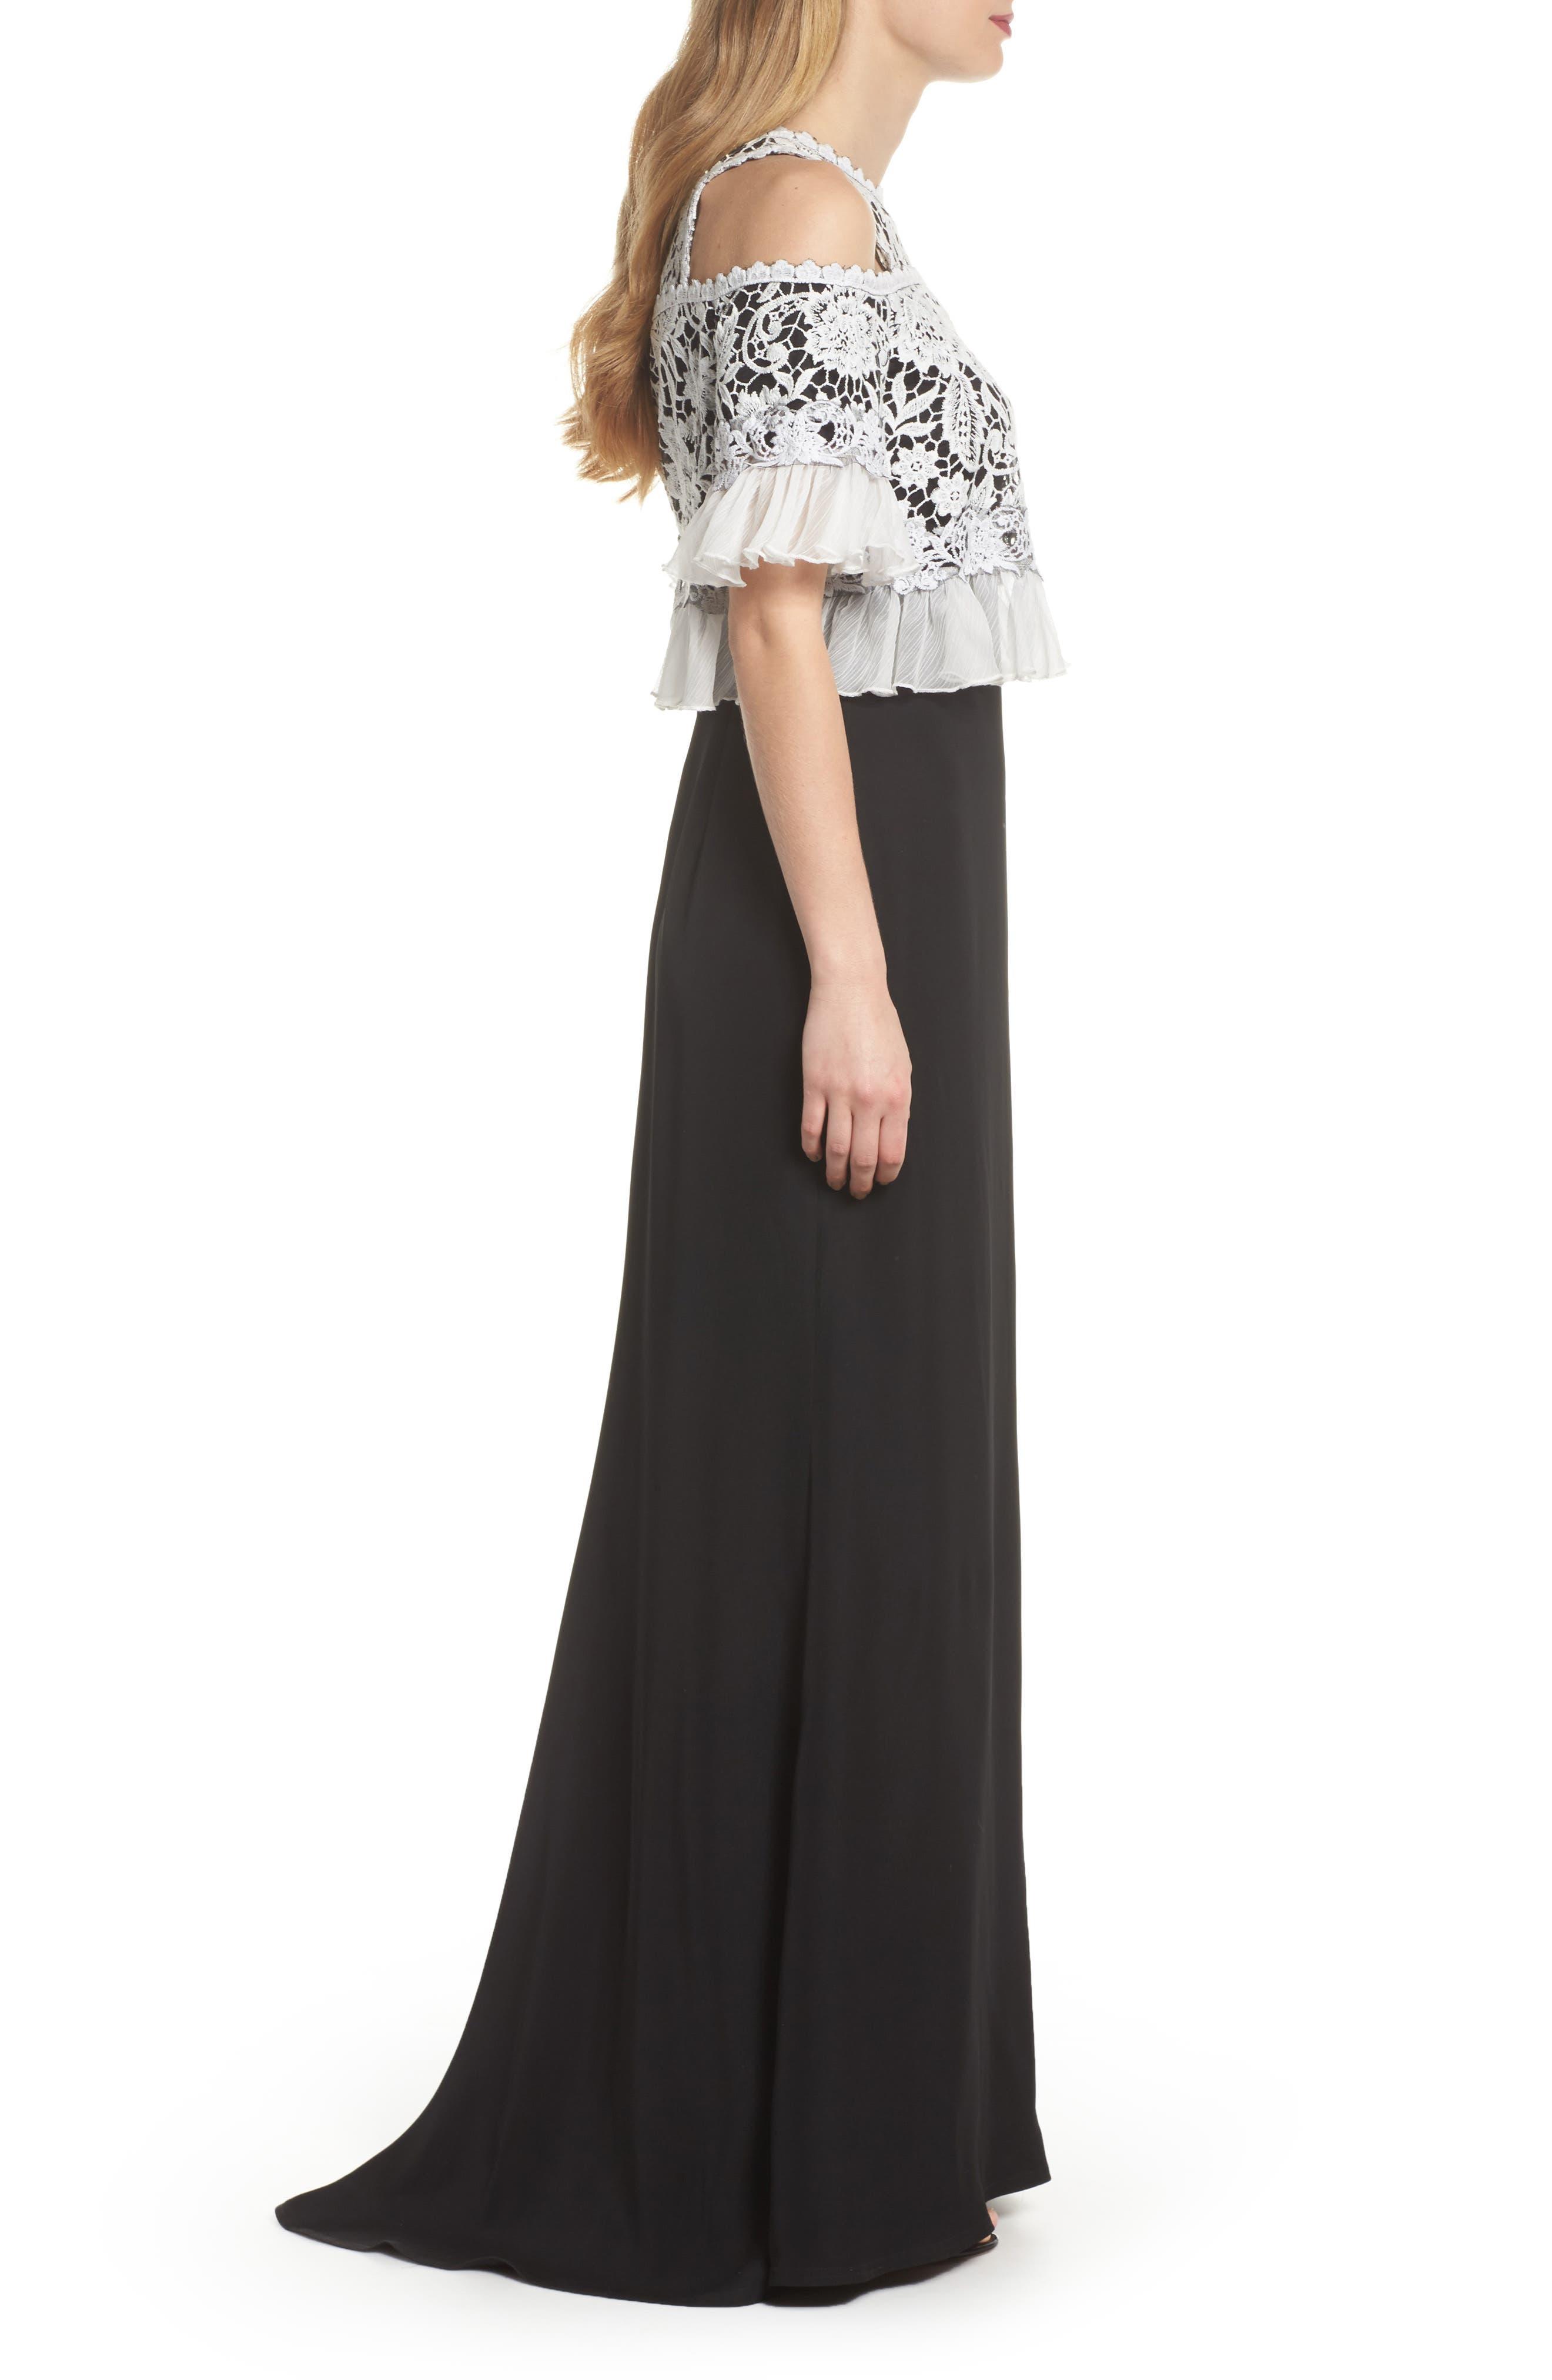 Crochet Bodice Gown,                             Alternate thumbnail 3, color,                             Black/ Ivory